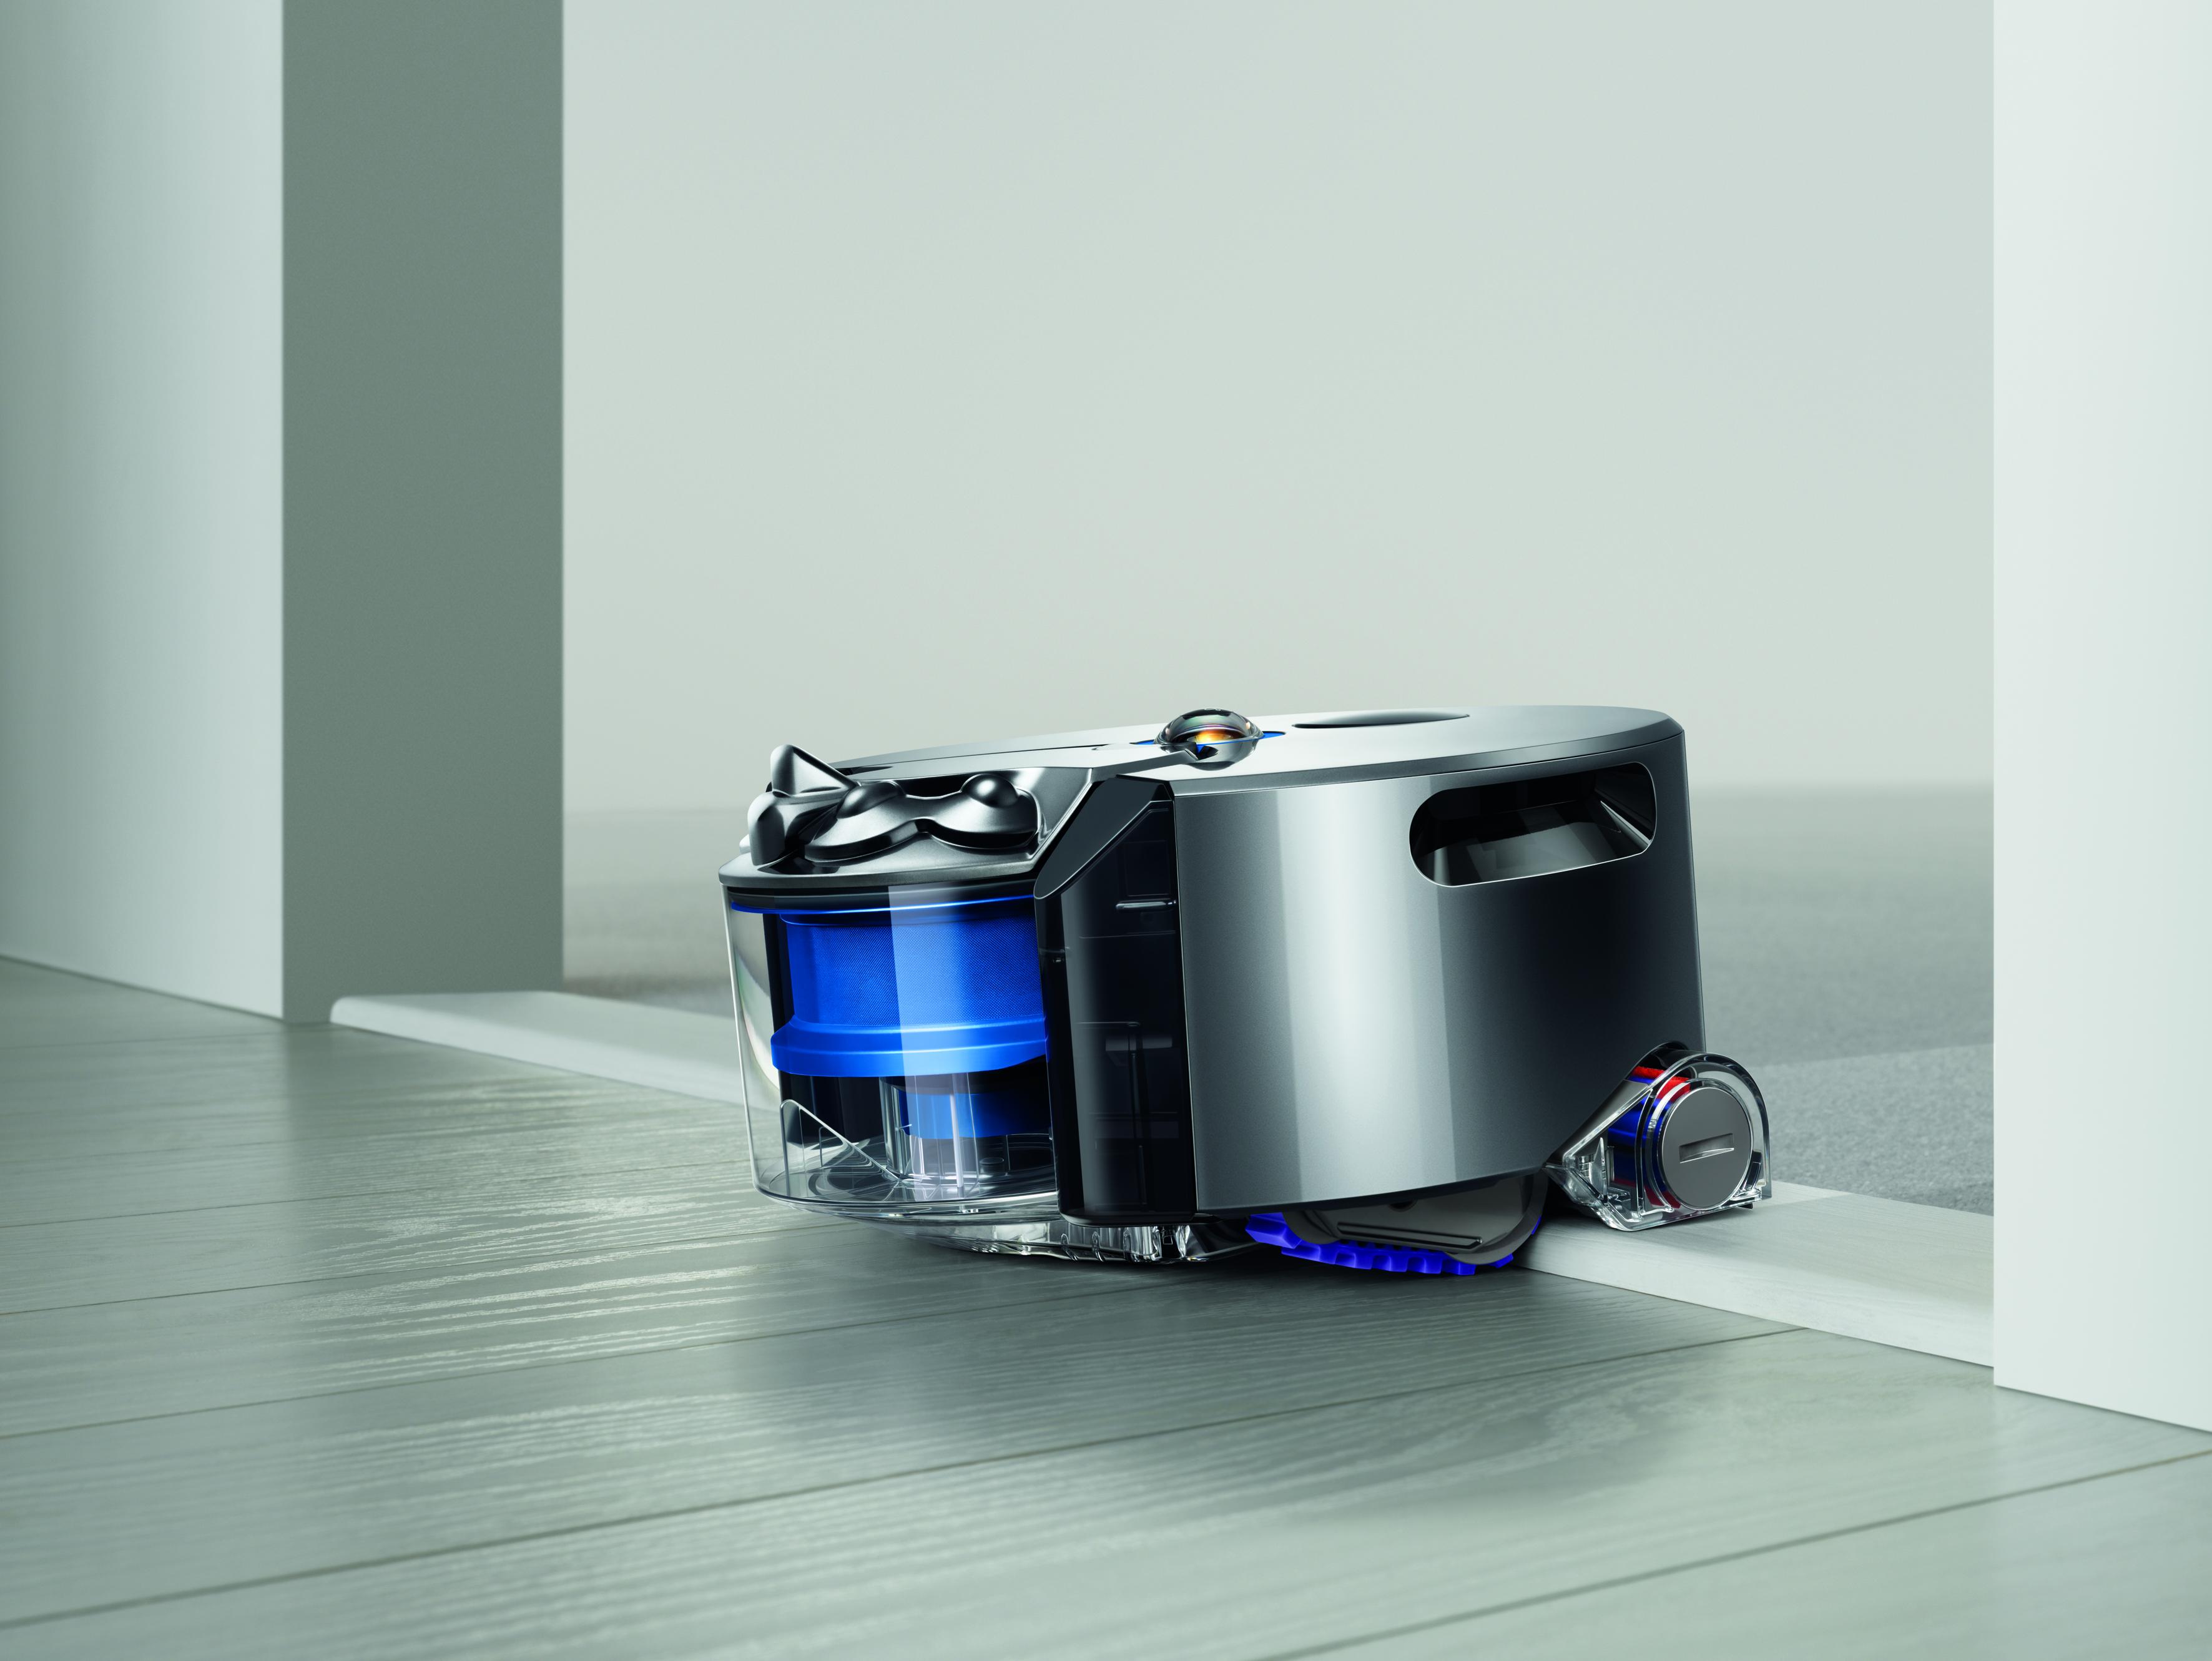 Dyson 360 Eye robotic vacuum cleaner